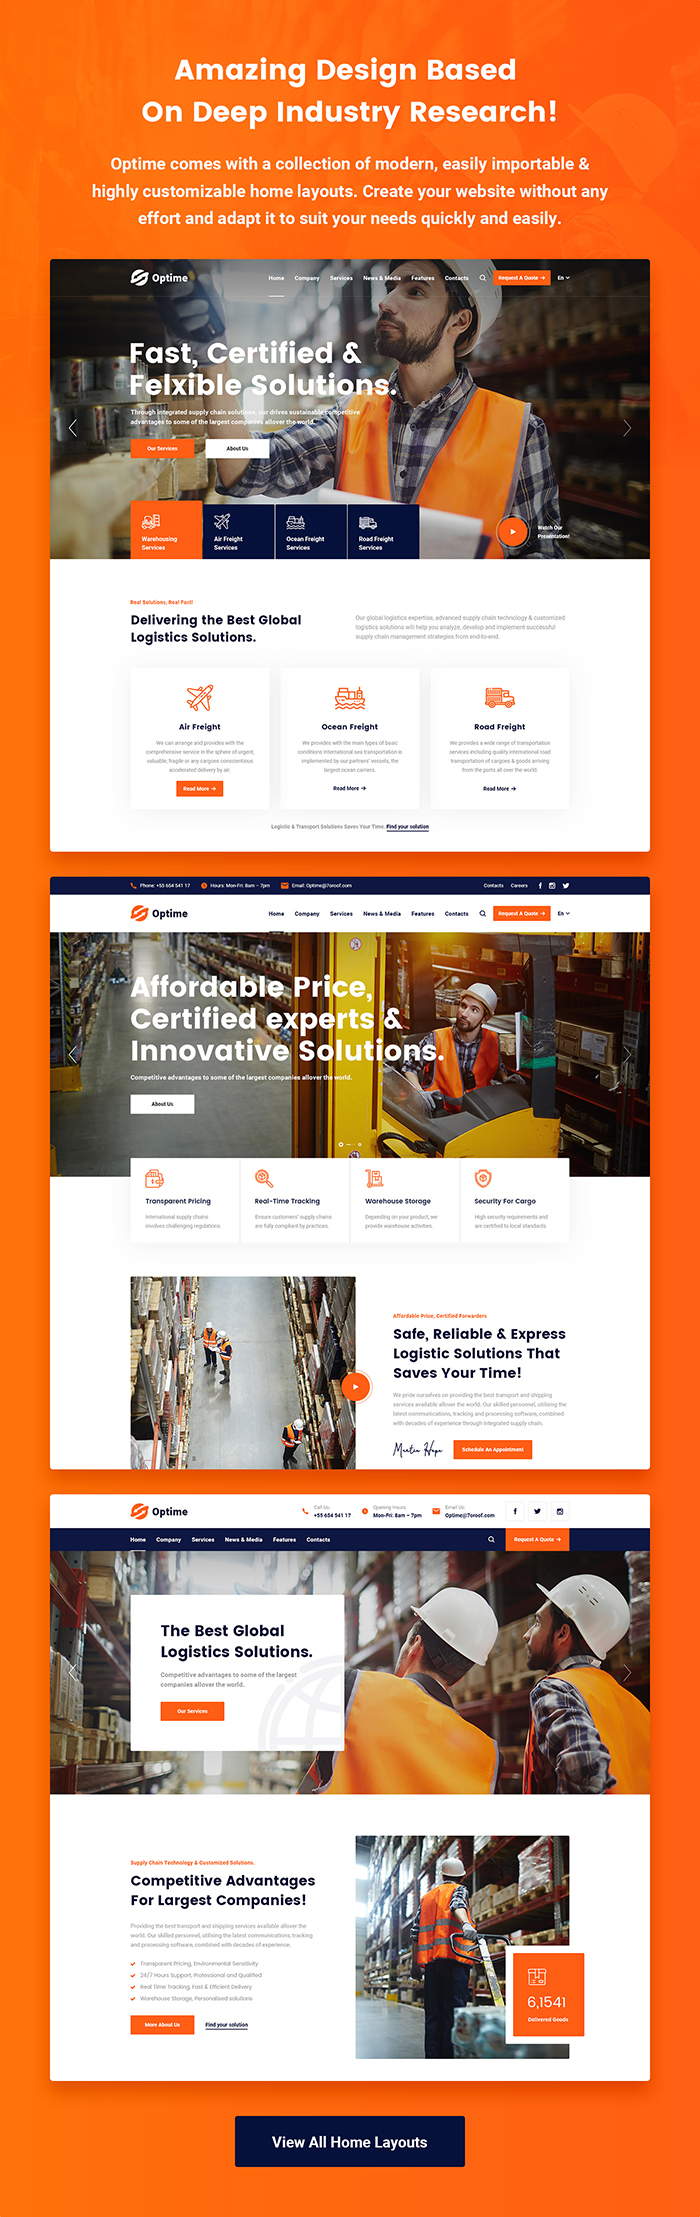 Optime - Logistics & Transportation WordPress Theme - 5